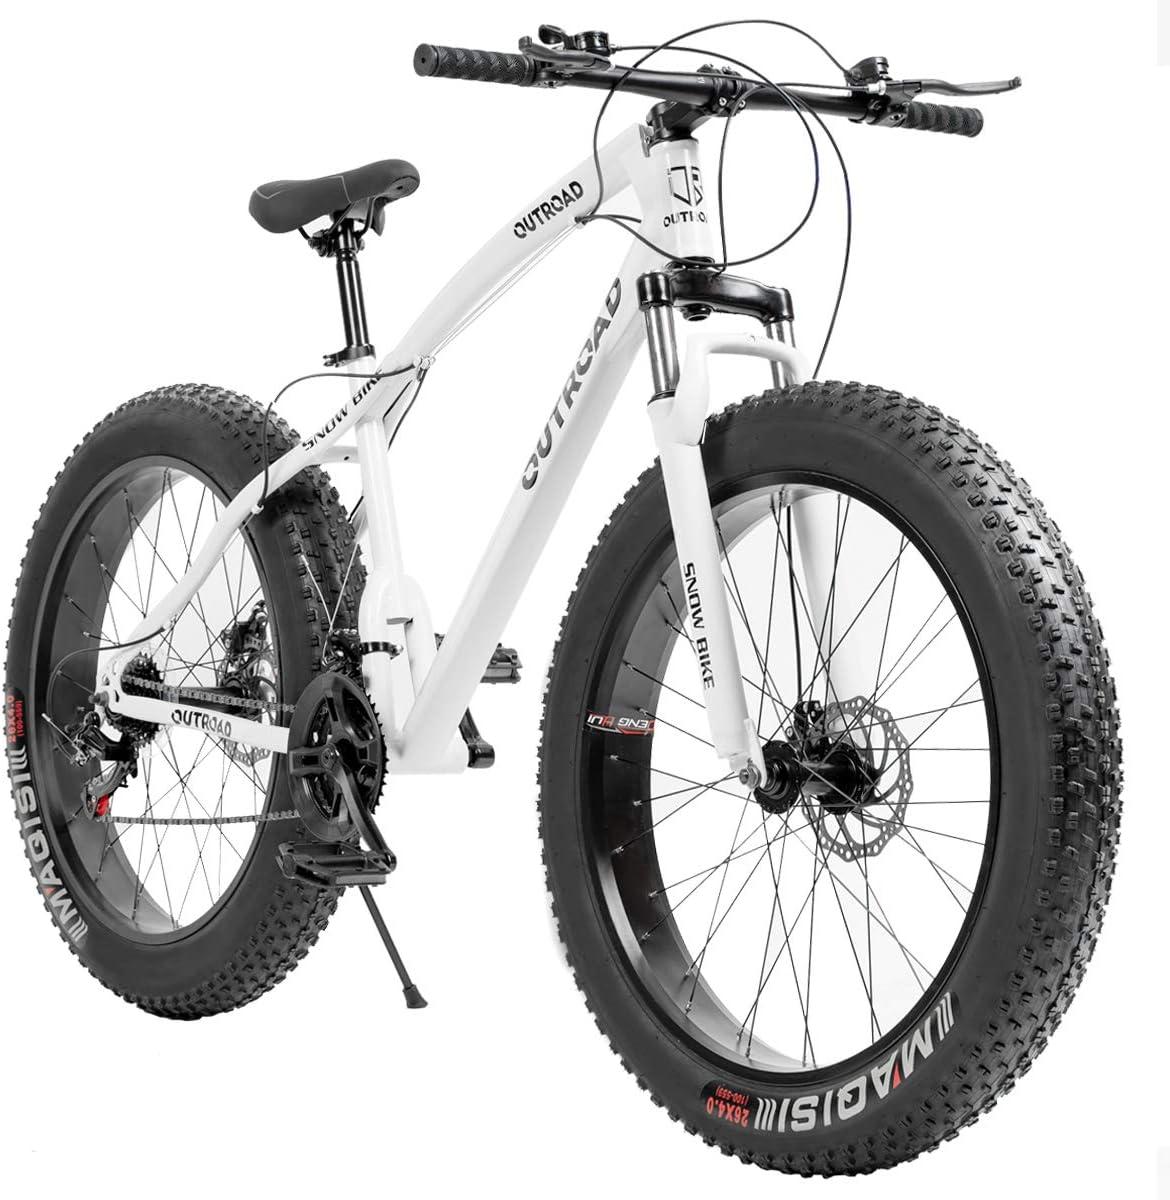 Outroad Mountain Bike 21 Speed Anti-Slip Bike 26 inch Fat Tire Sand Bike Double Disc Brake Suspension Fork Suspension, White or Black